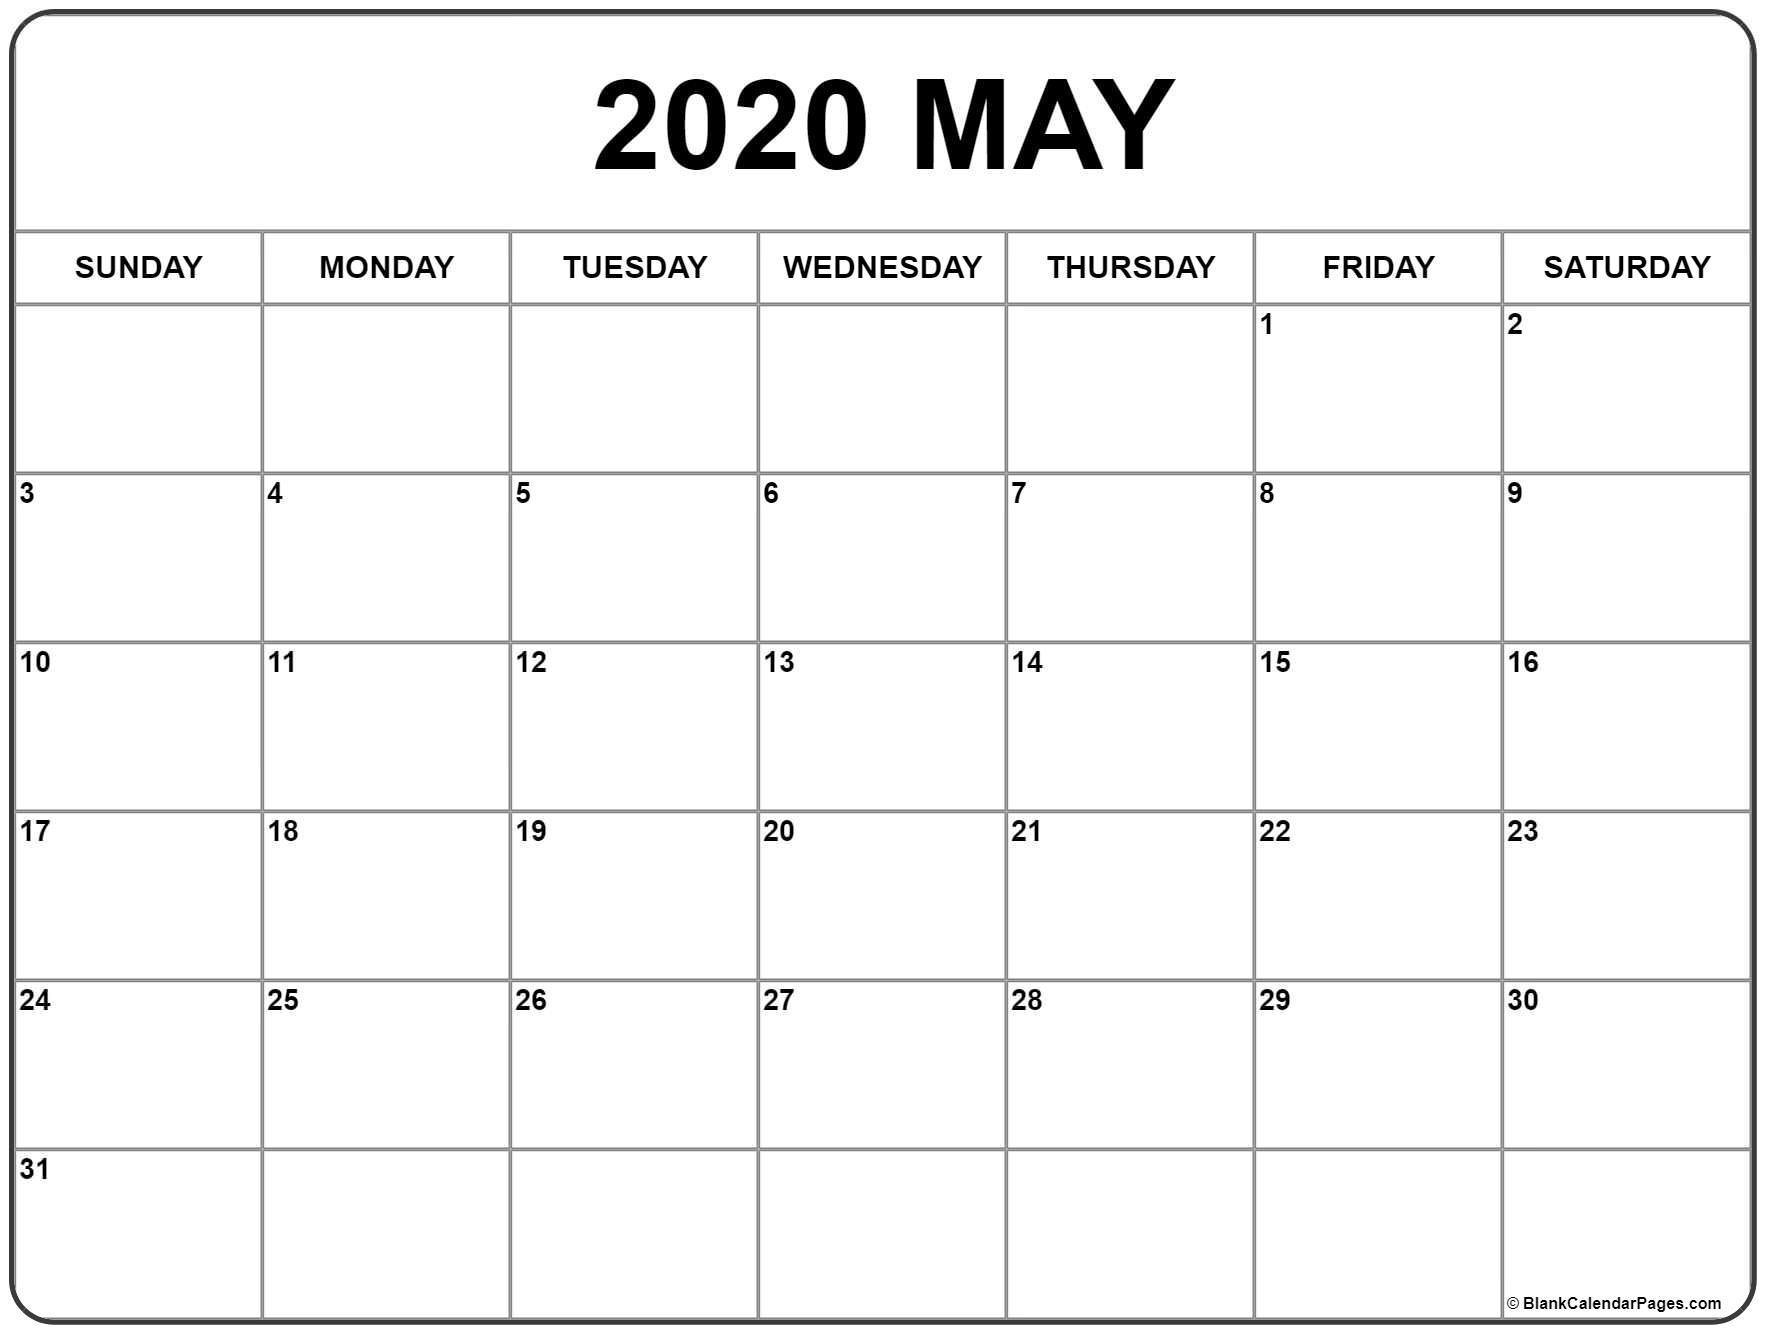 May 2020 Calendar | Free Printable Monthly Calendars  Full Page Blank Calendar Printable